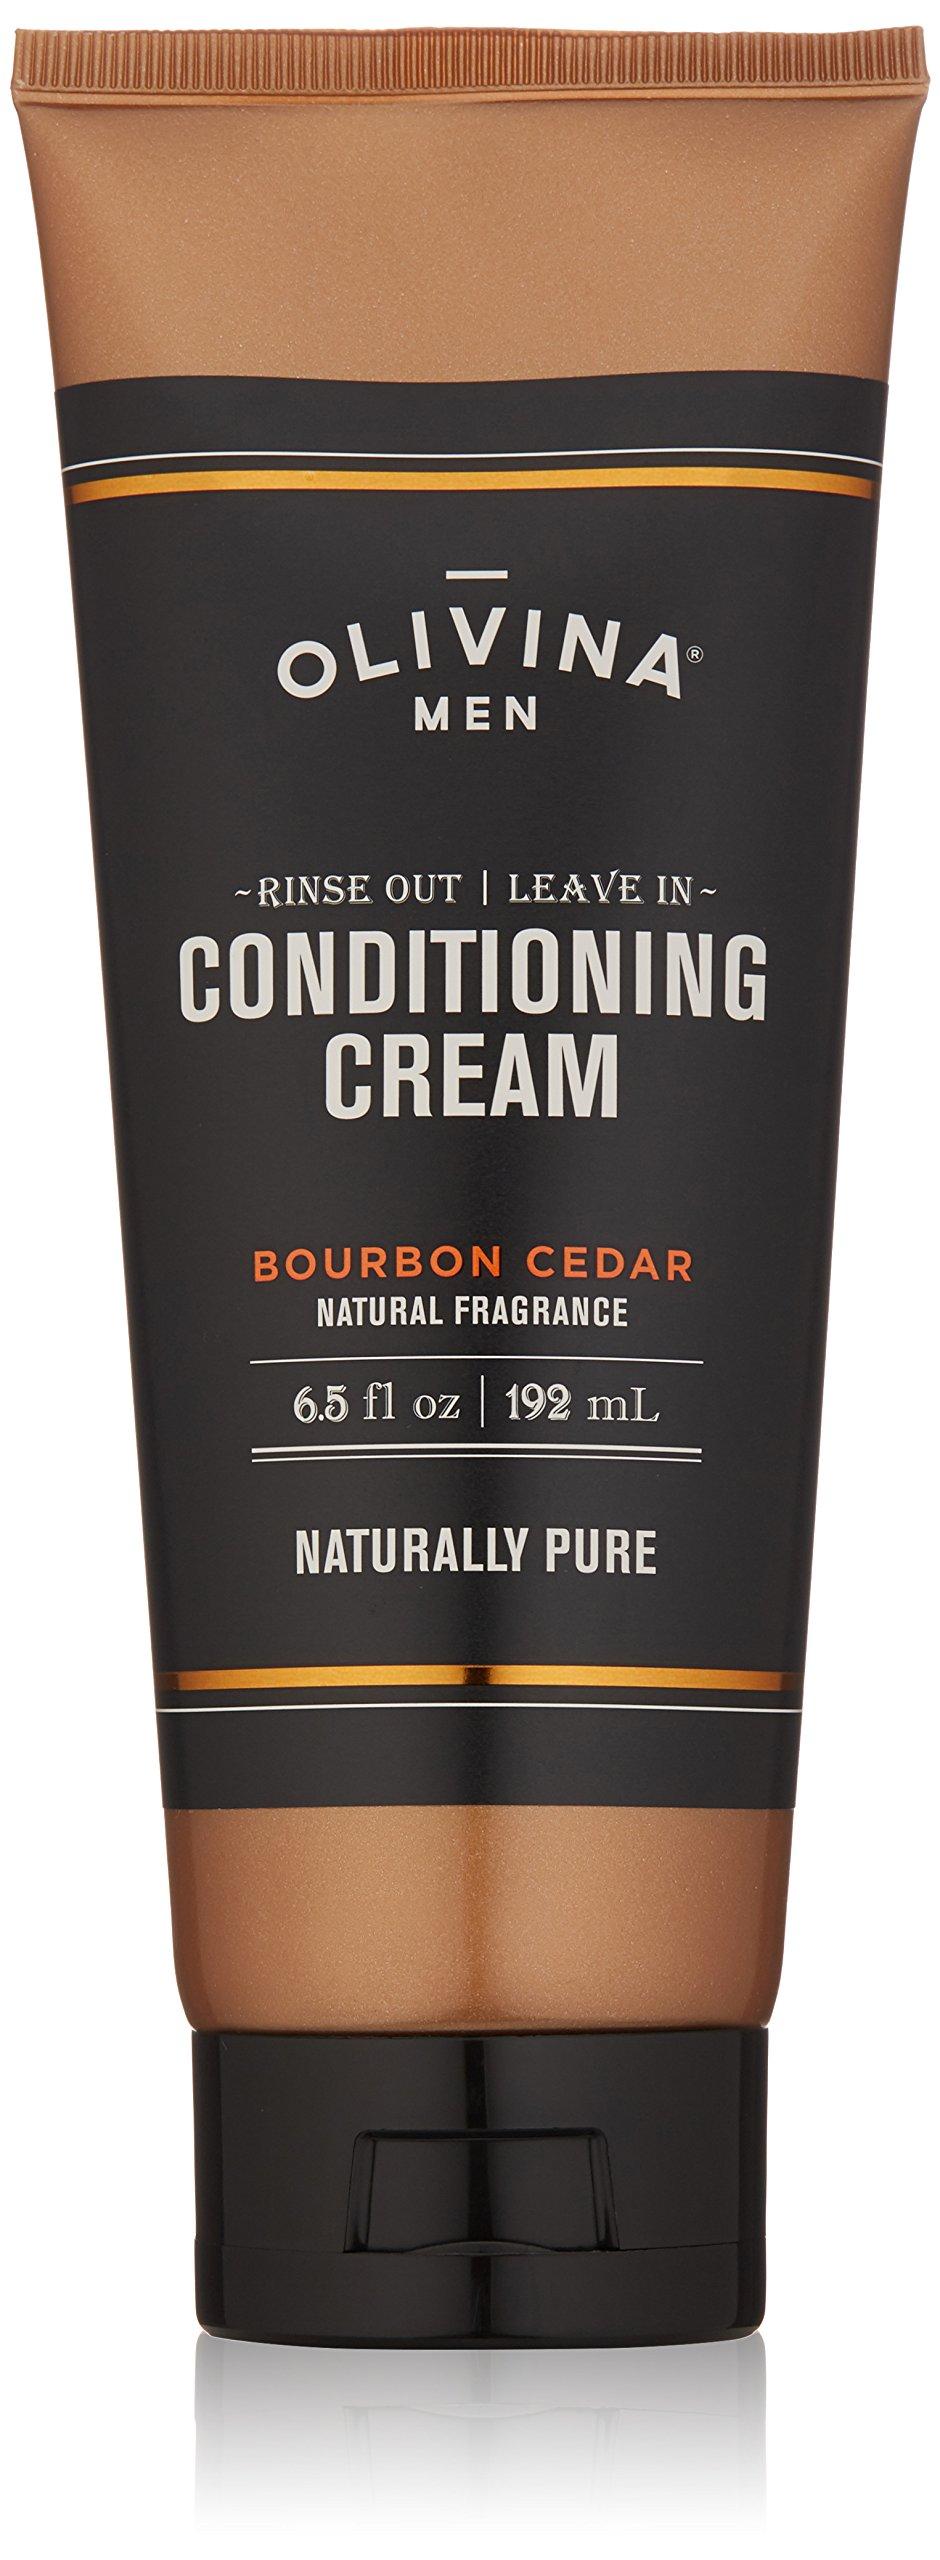 Olivina Men Rinse Out/Leave In Conditioning Cream, Bourbon Cedar, 6.5 fl. oz.